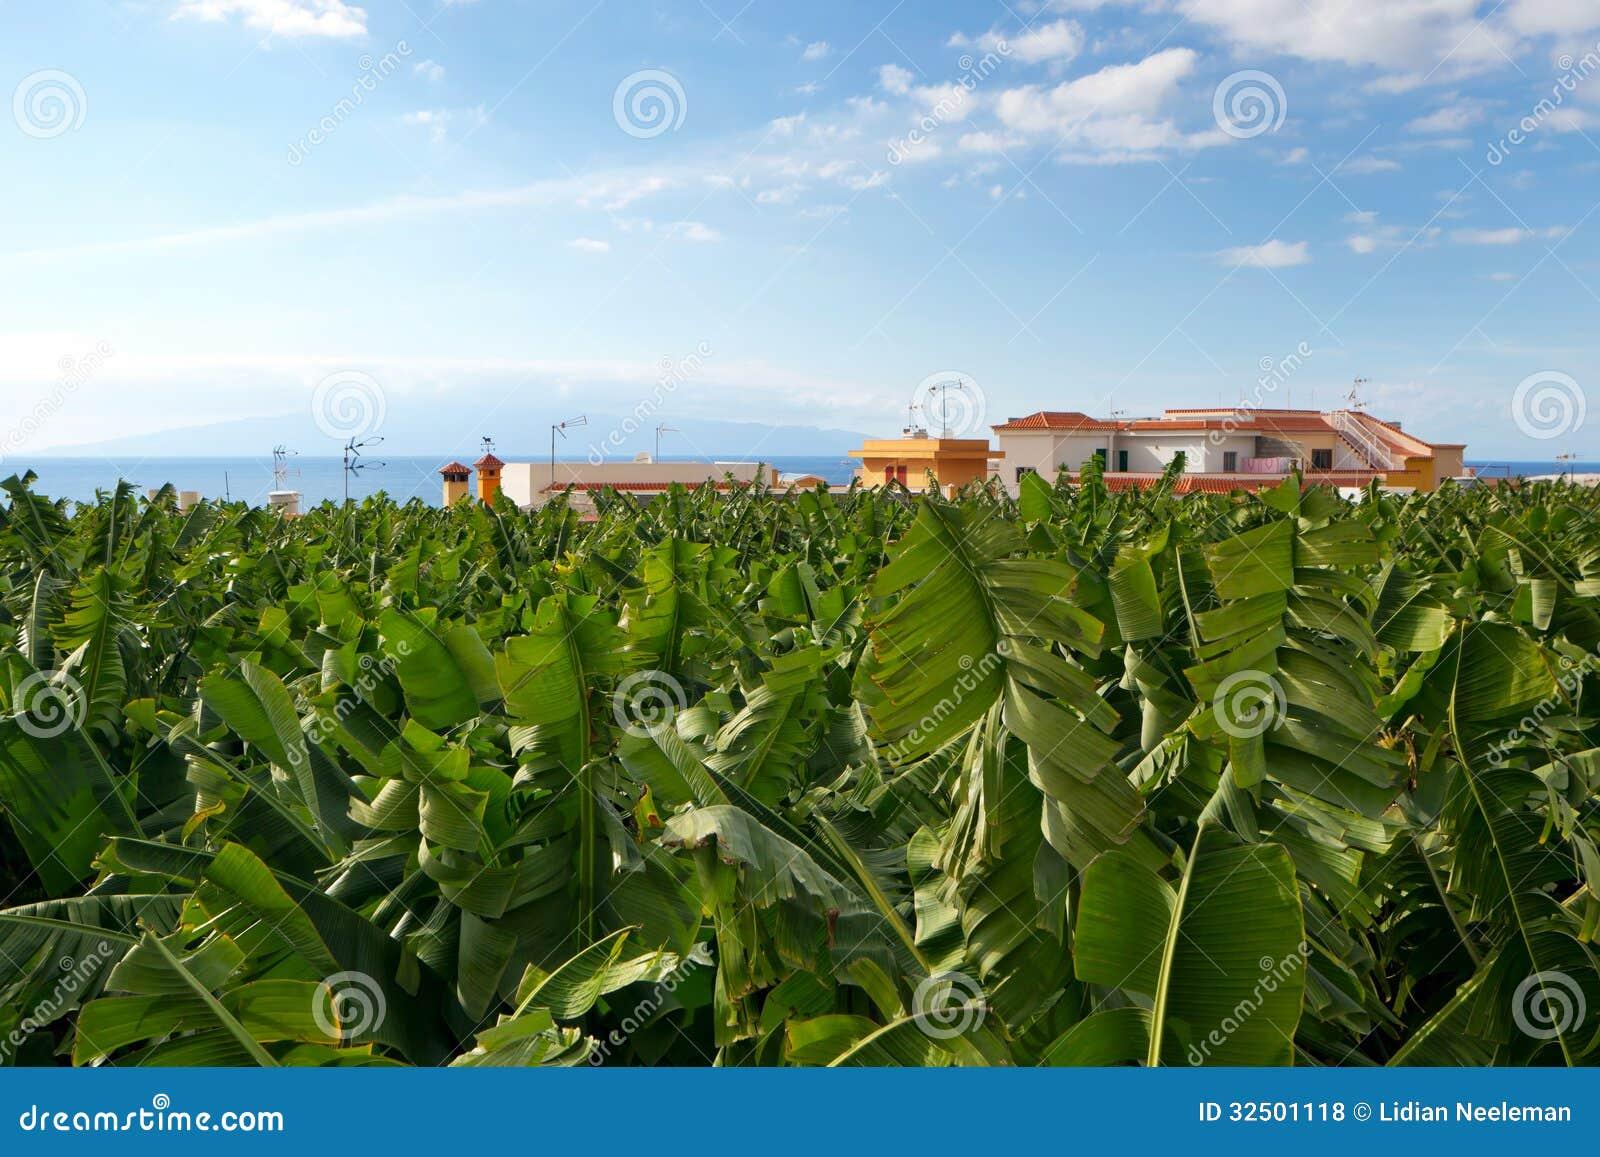 Banana plantation business plan